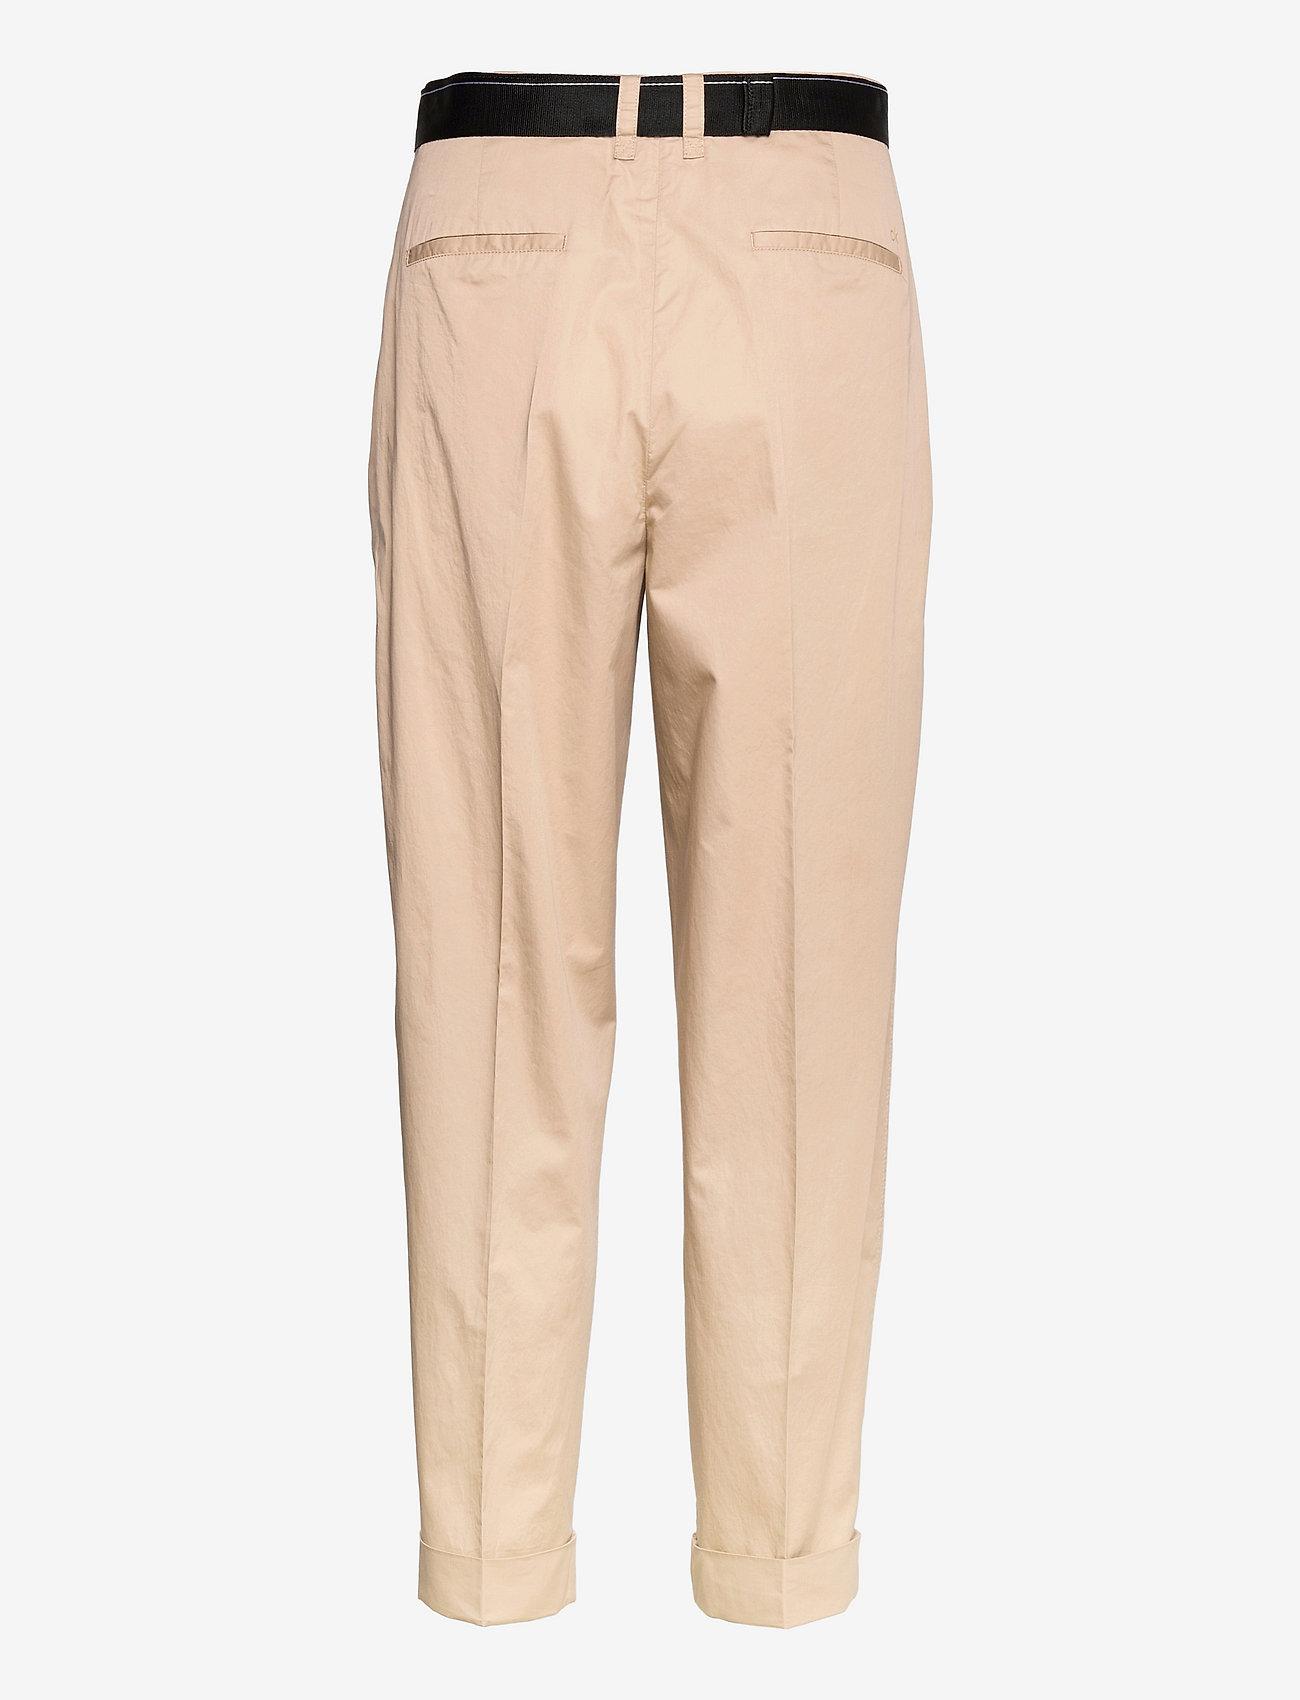 Calvin Klein - SILKY TOUCH PANT - pantalons droits - humus - 1